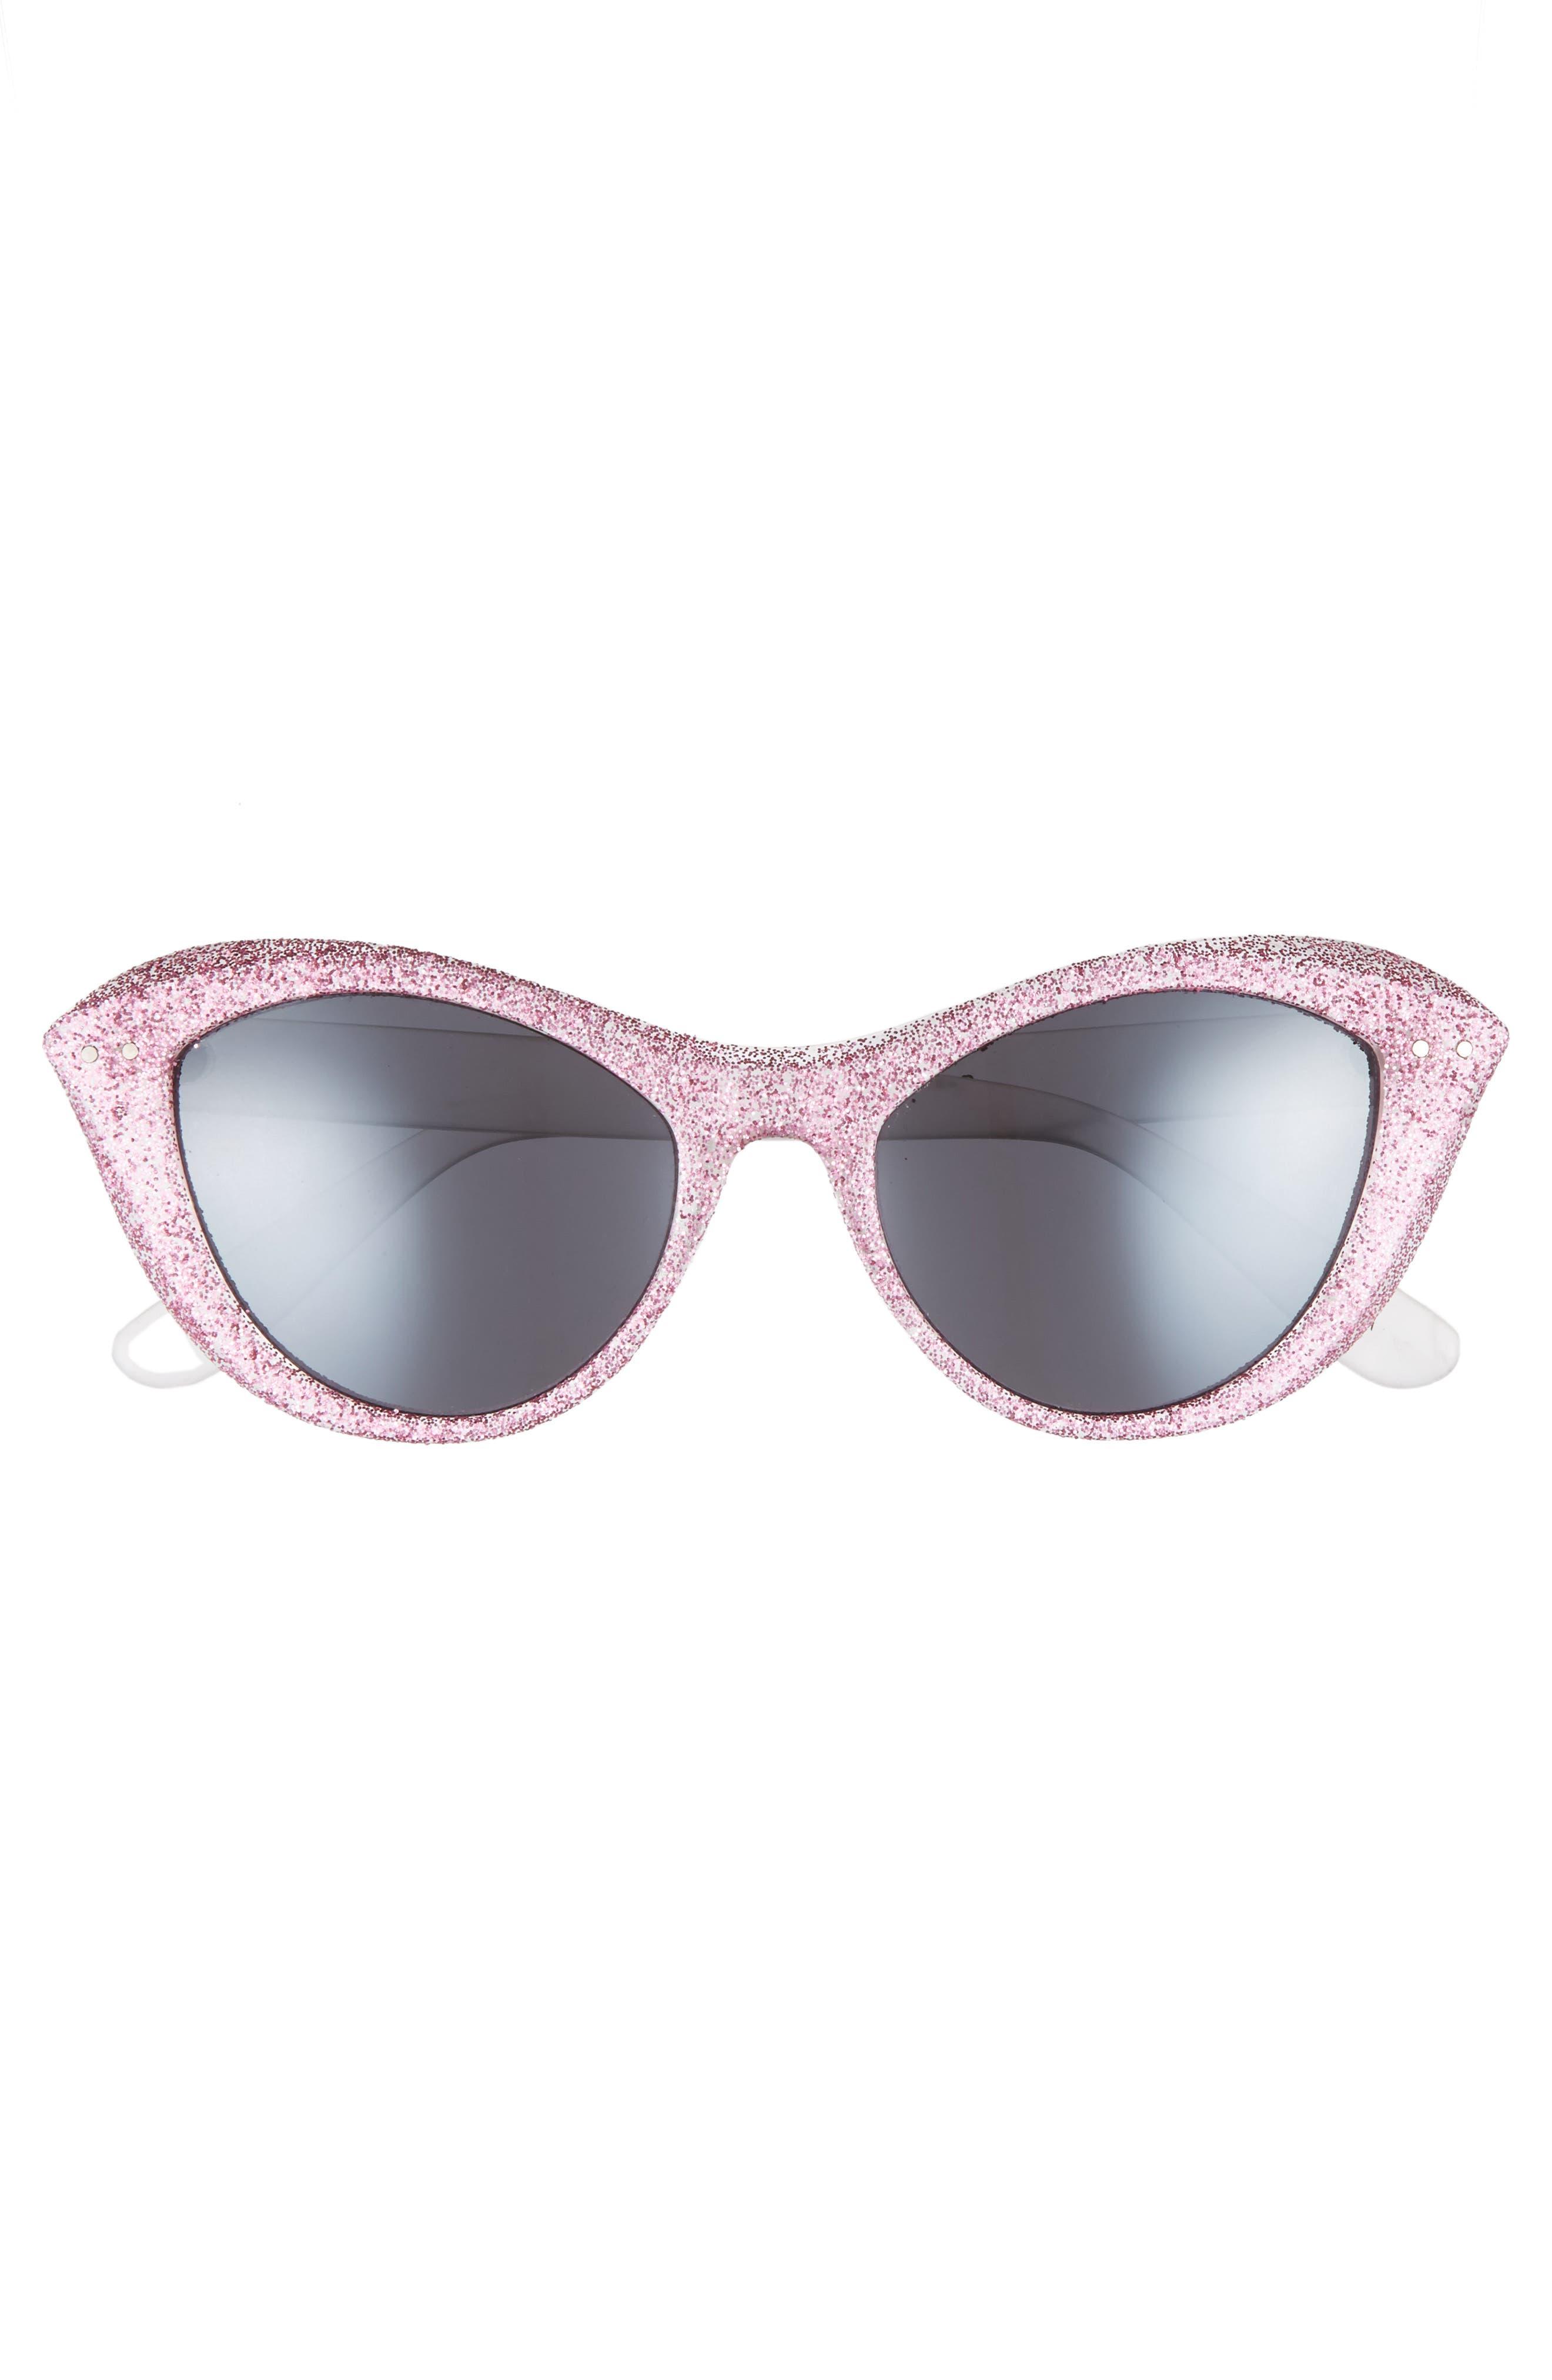 50mm Retro Cat Eye Sunglasses,                             Alternate thumbnail 3, color,                             Milky White/ Pink